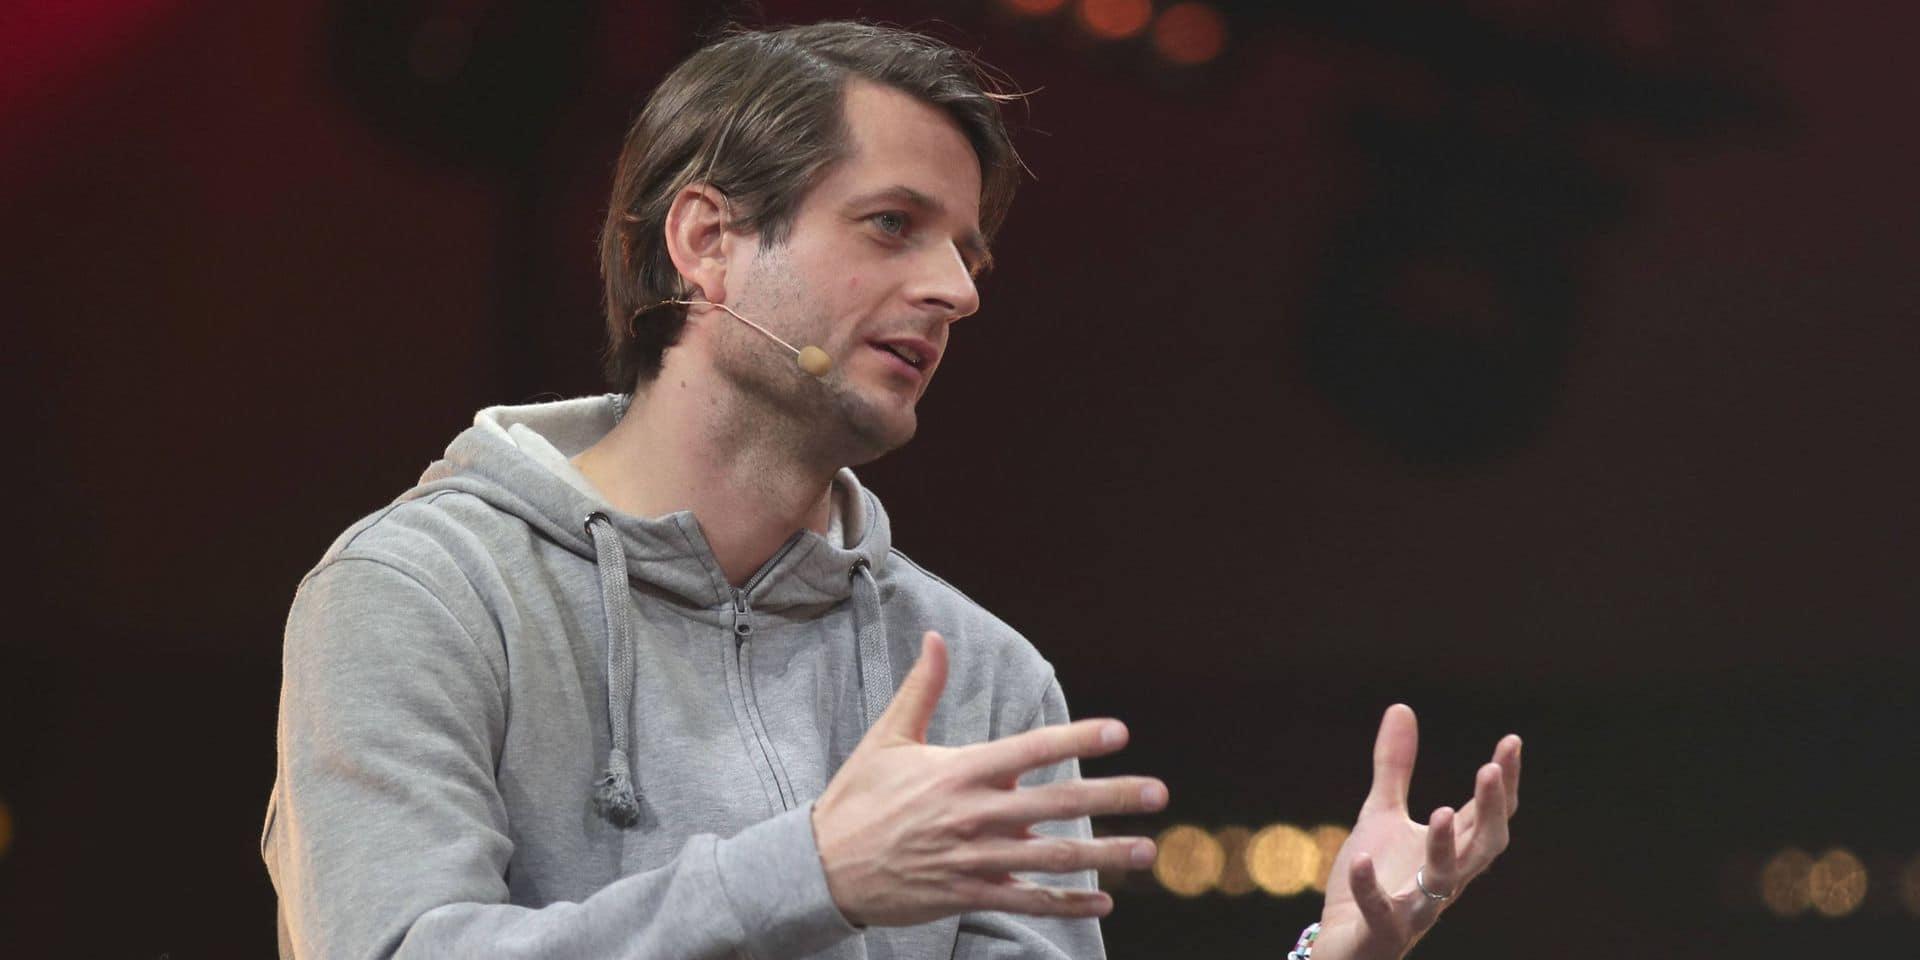 Sebastian Siemiatkowski a cofondé Klarna avec Niklas Adalberth et Victor Jacobsson en 2005. Il dirige la fintech depuis 2010.